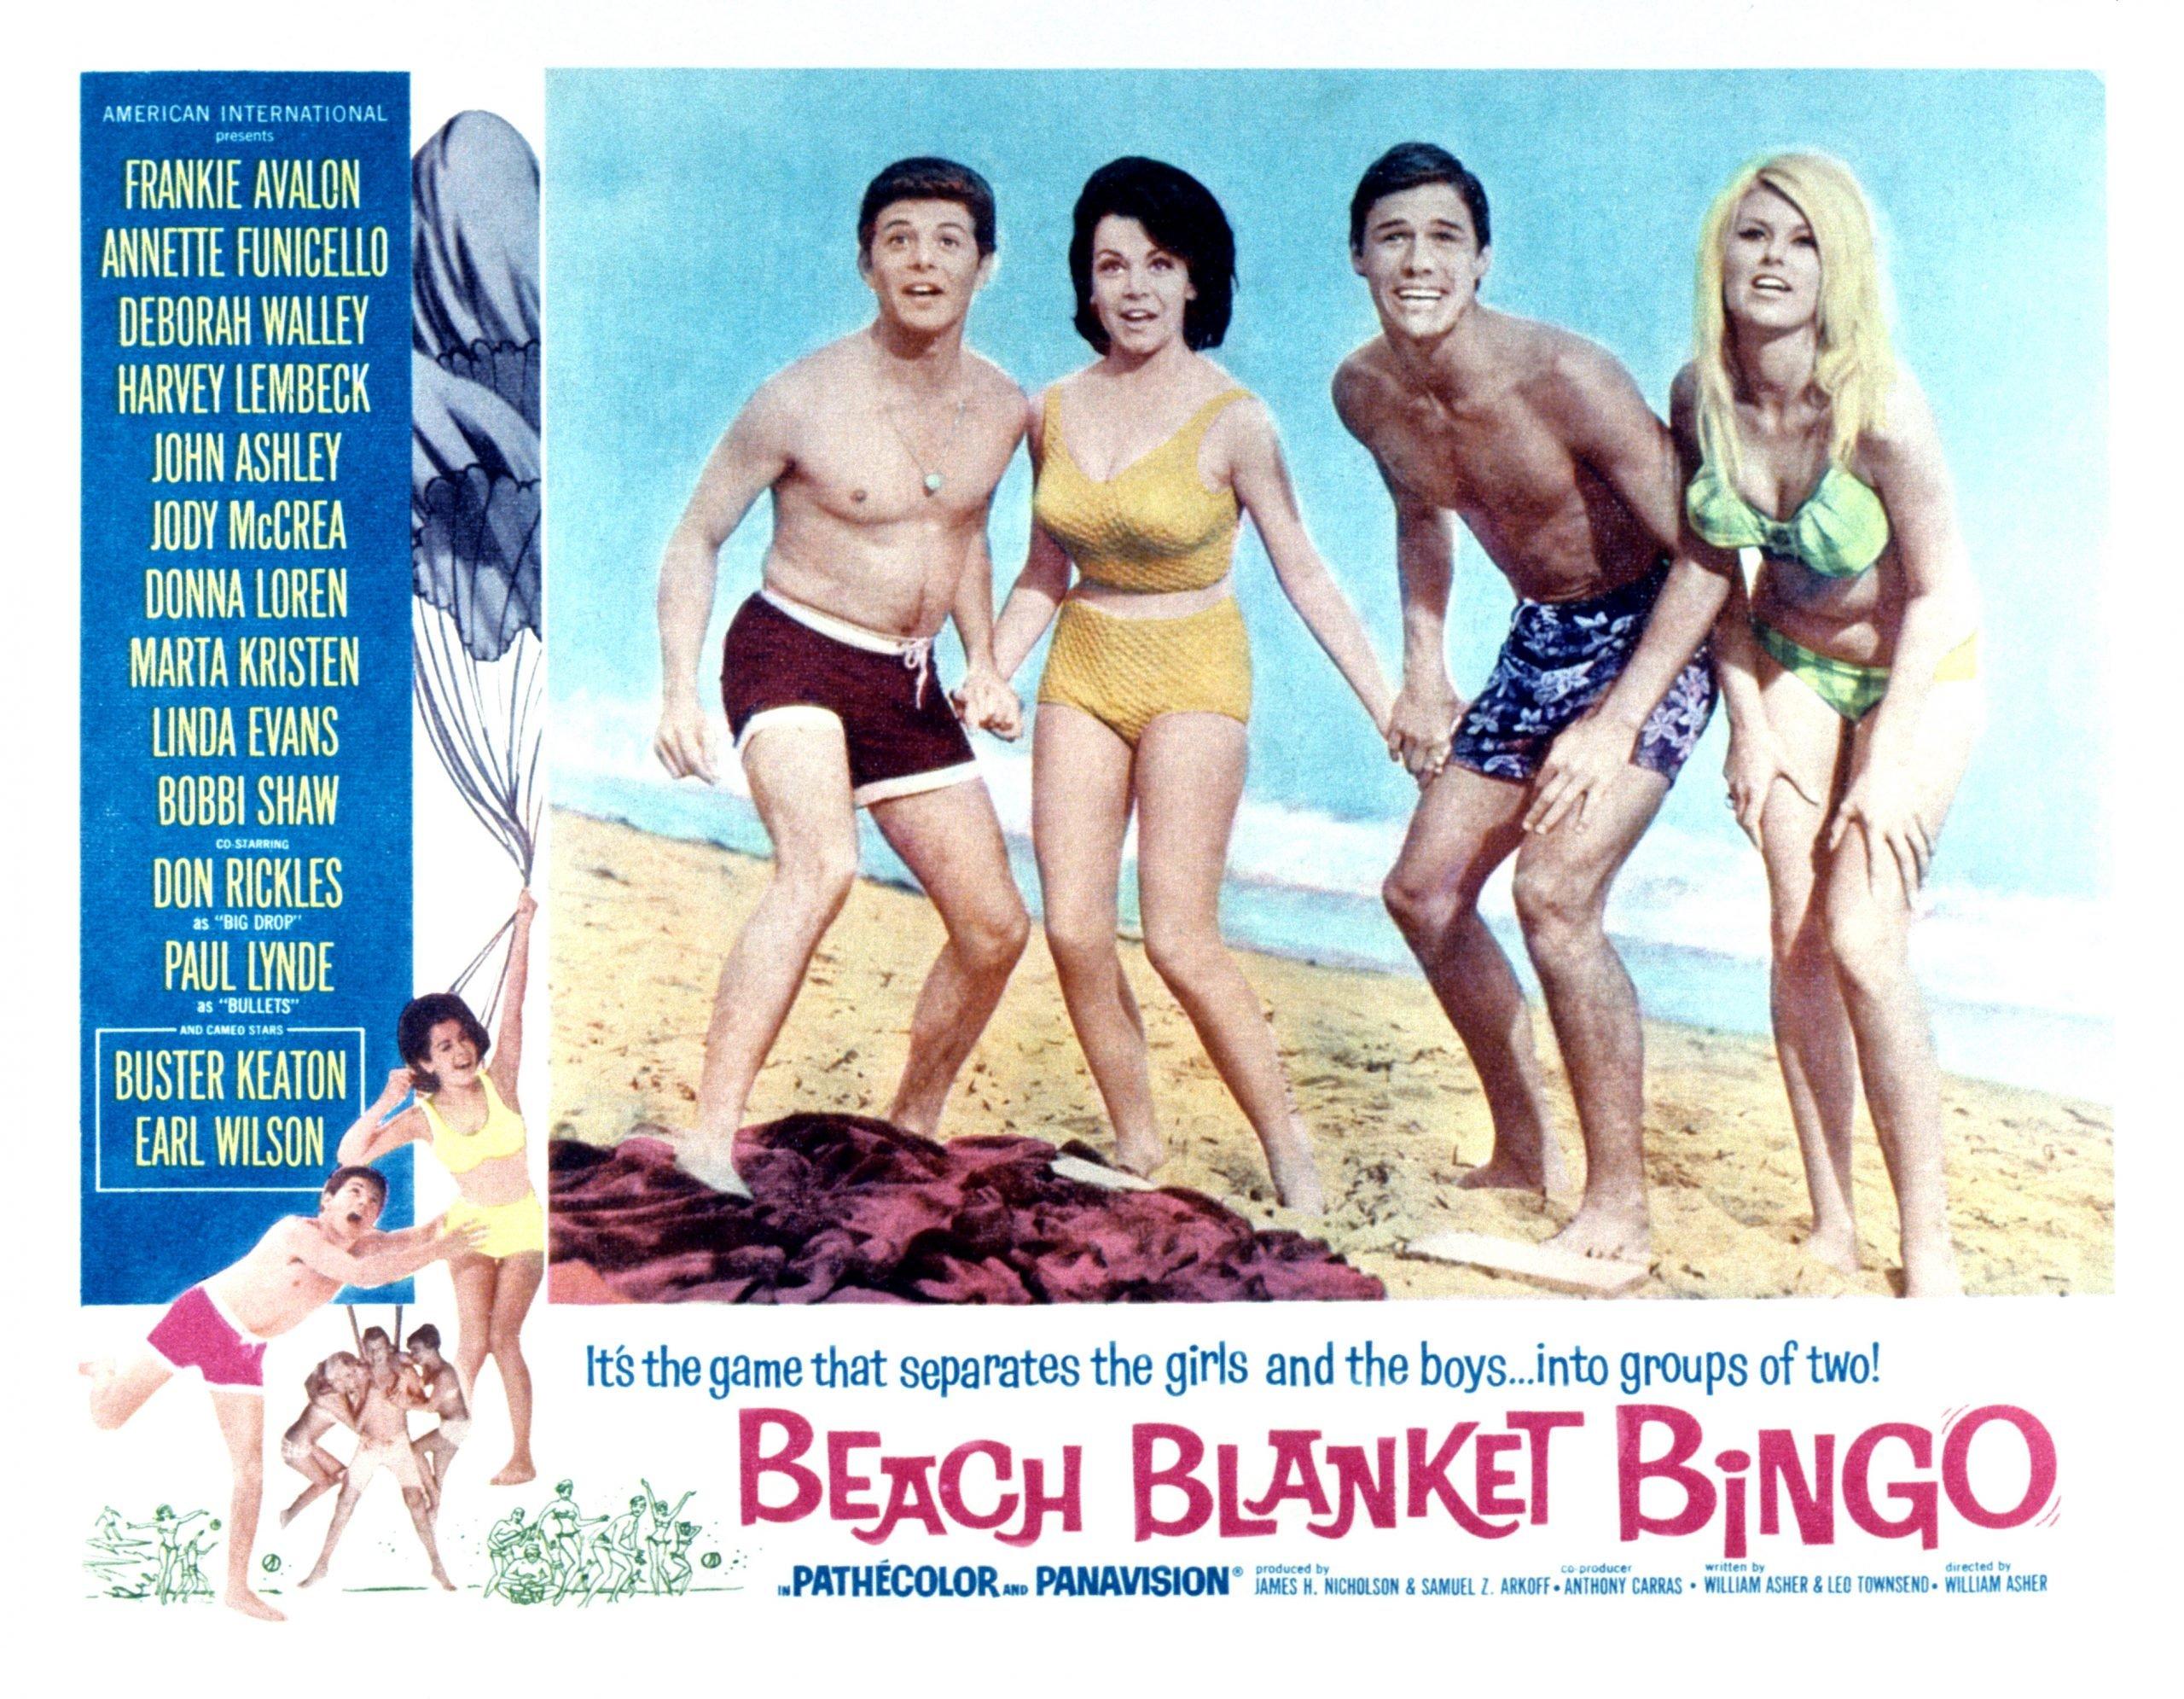 annette-funicello-beach-blanket-bingo